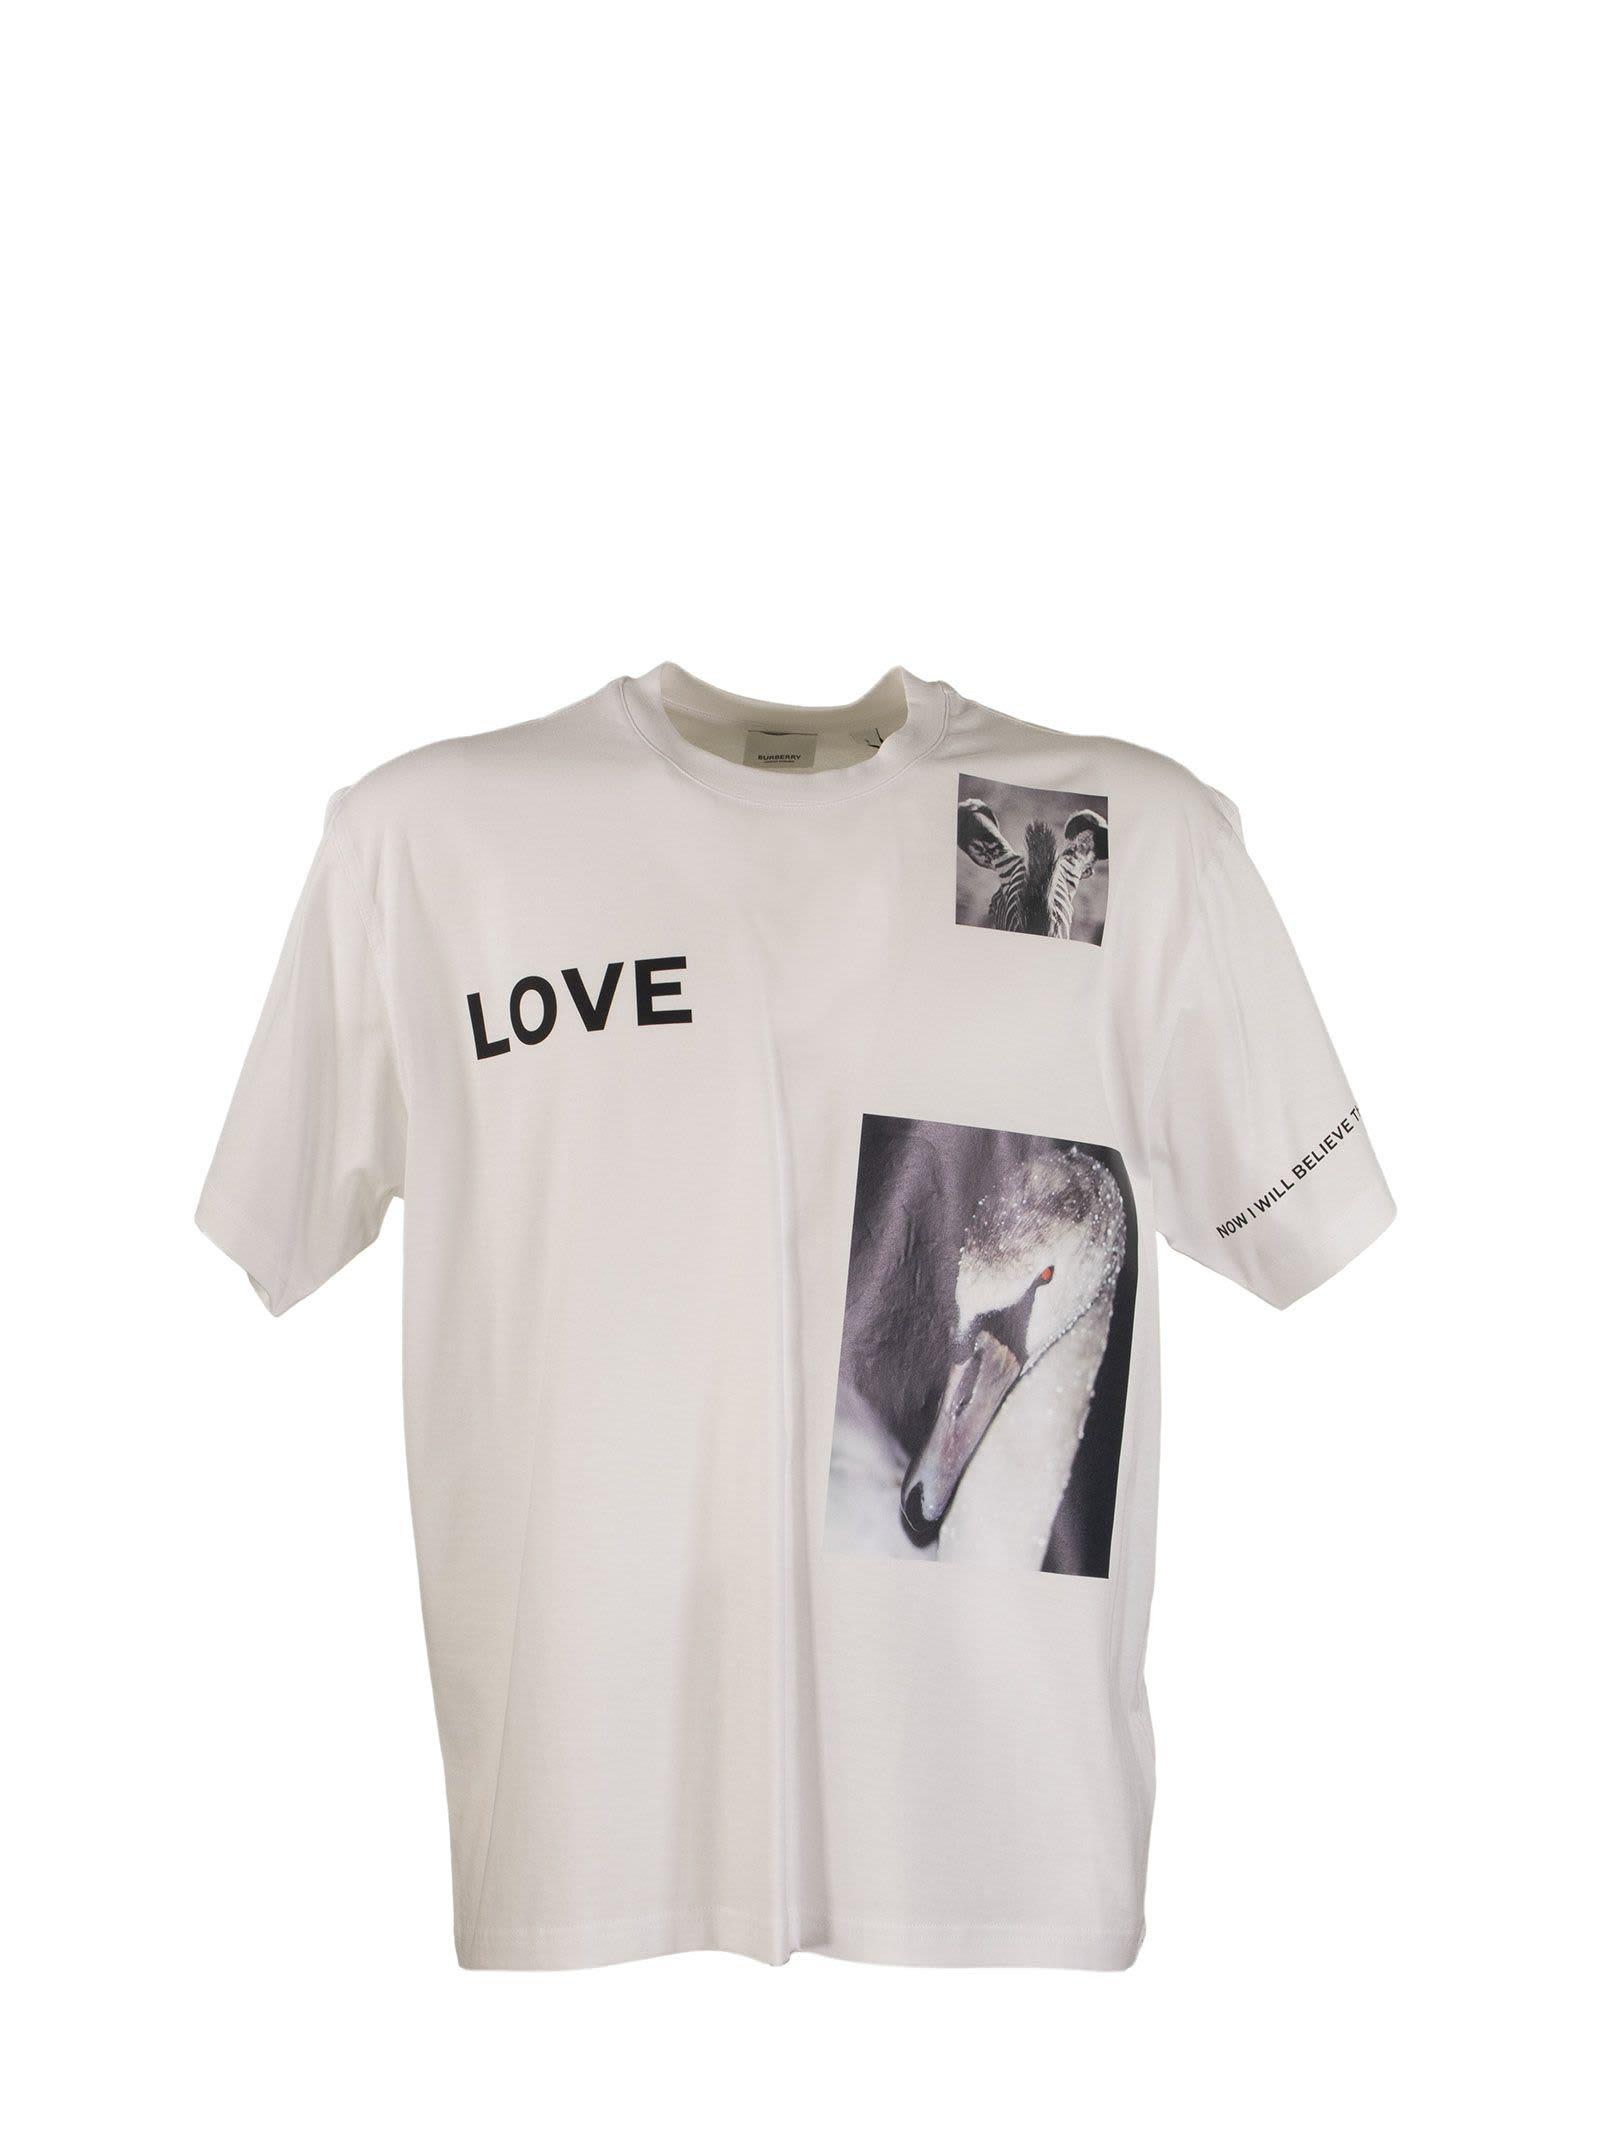 Burberry Montage Print Cotton T-shirt Love White